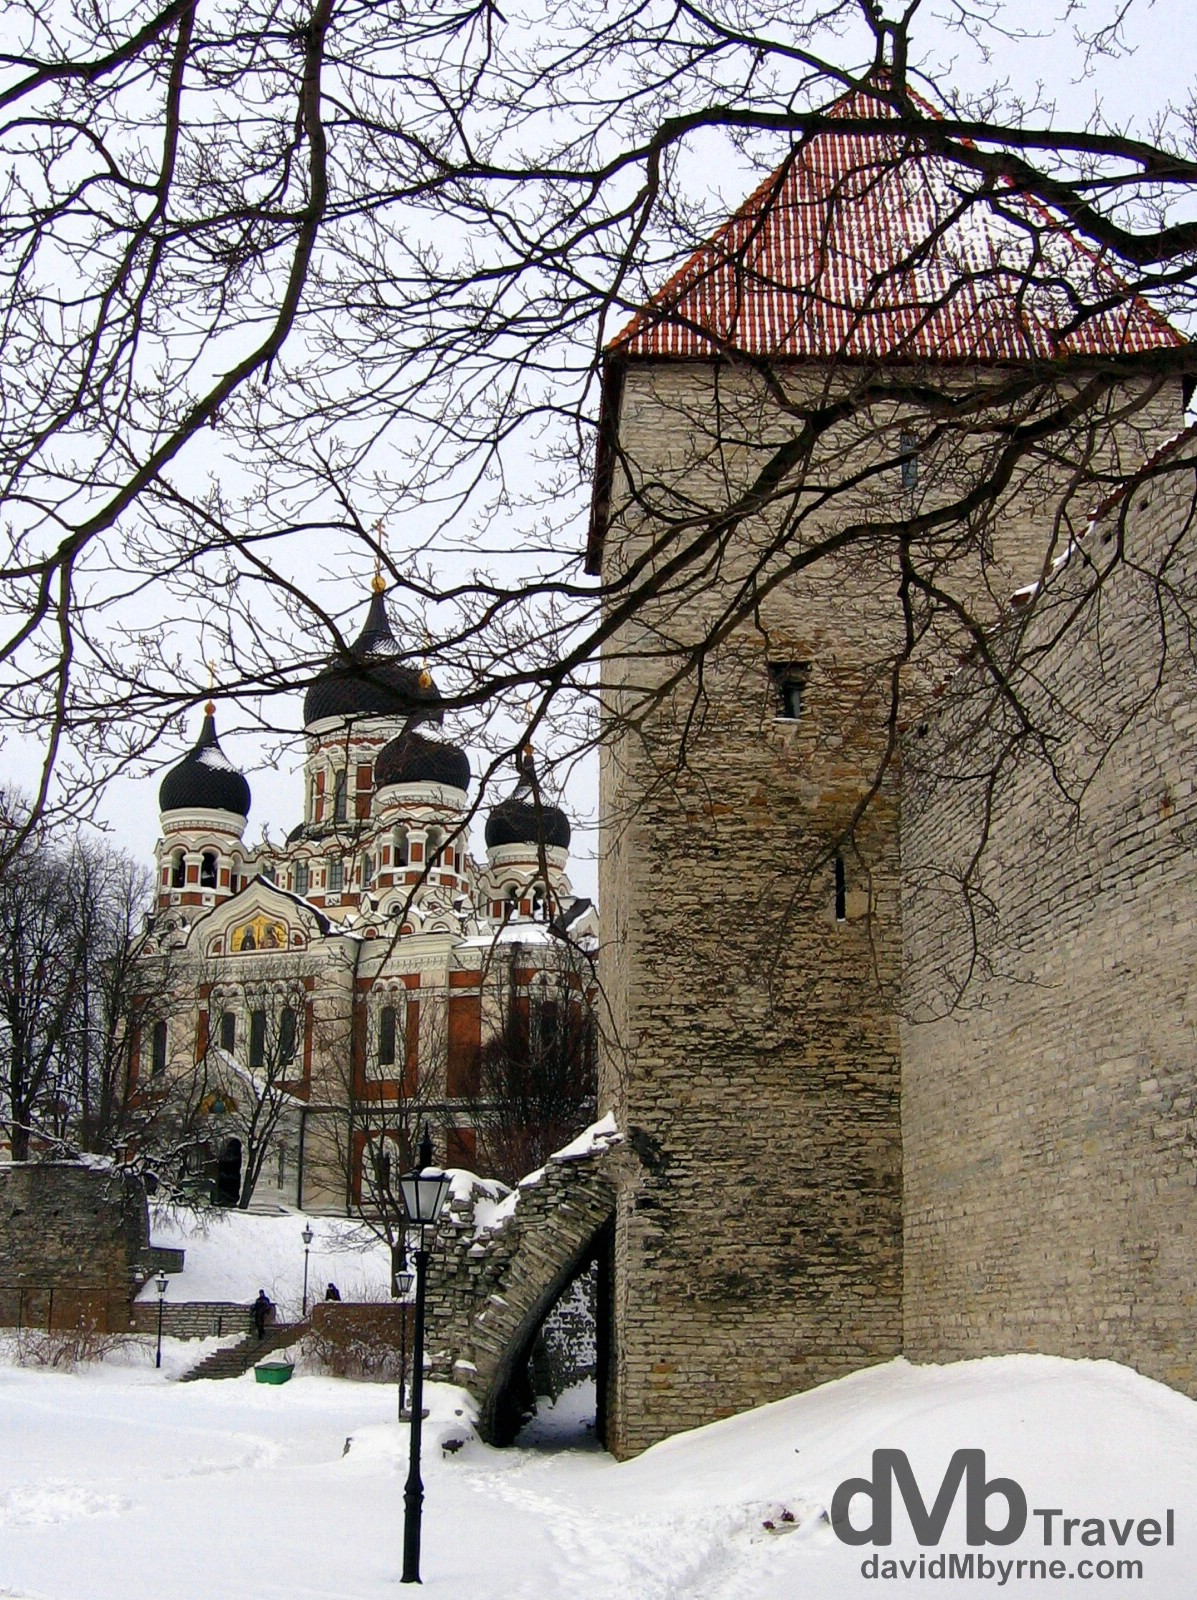 A wintry Old Town in Tallinn, Estonia. March 2, 2006.